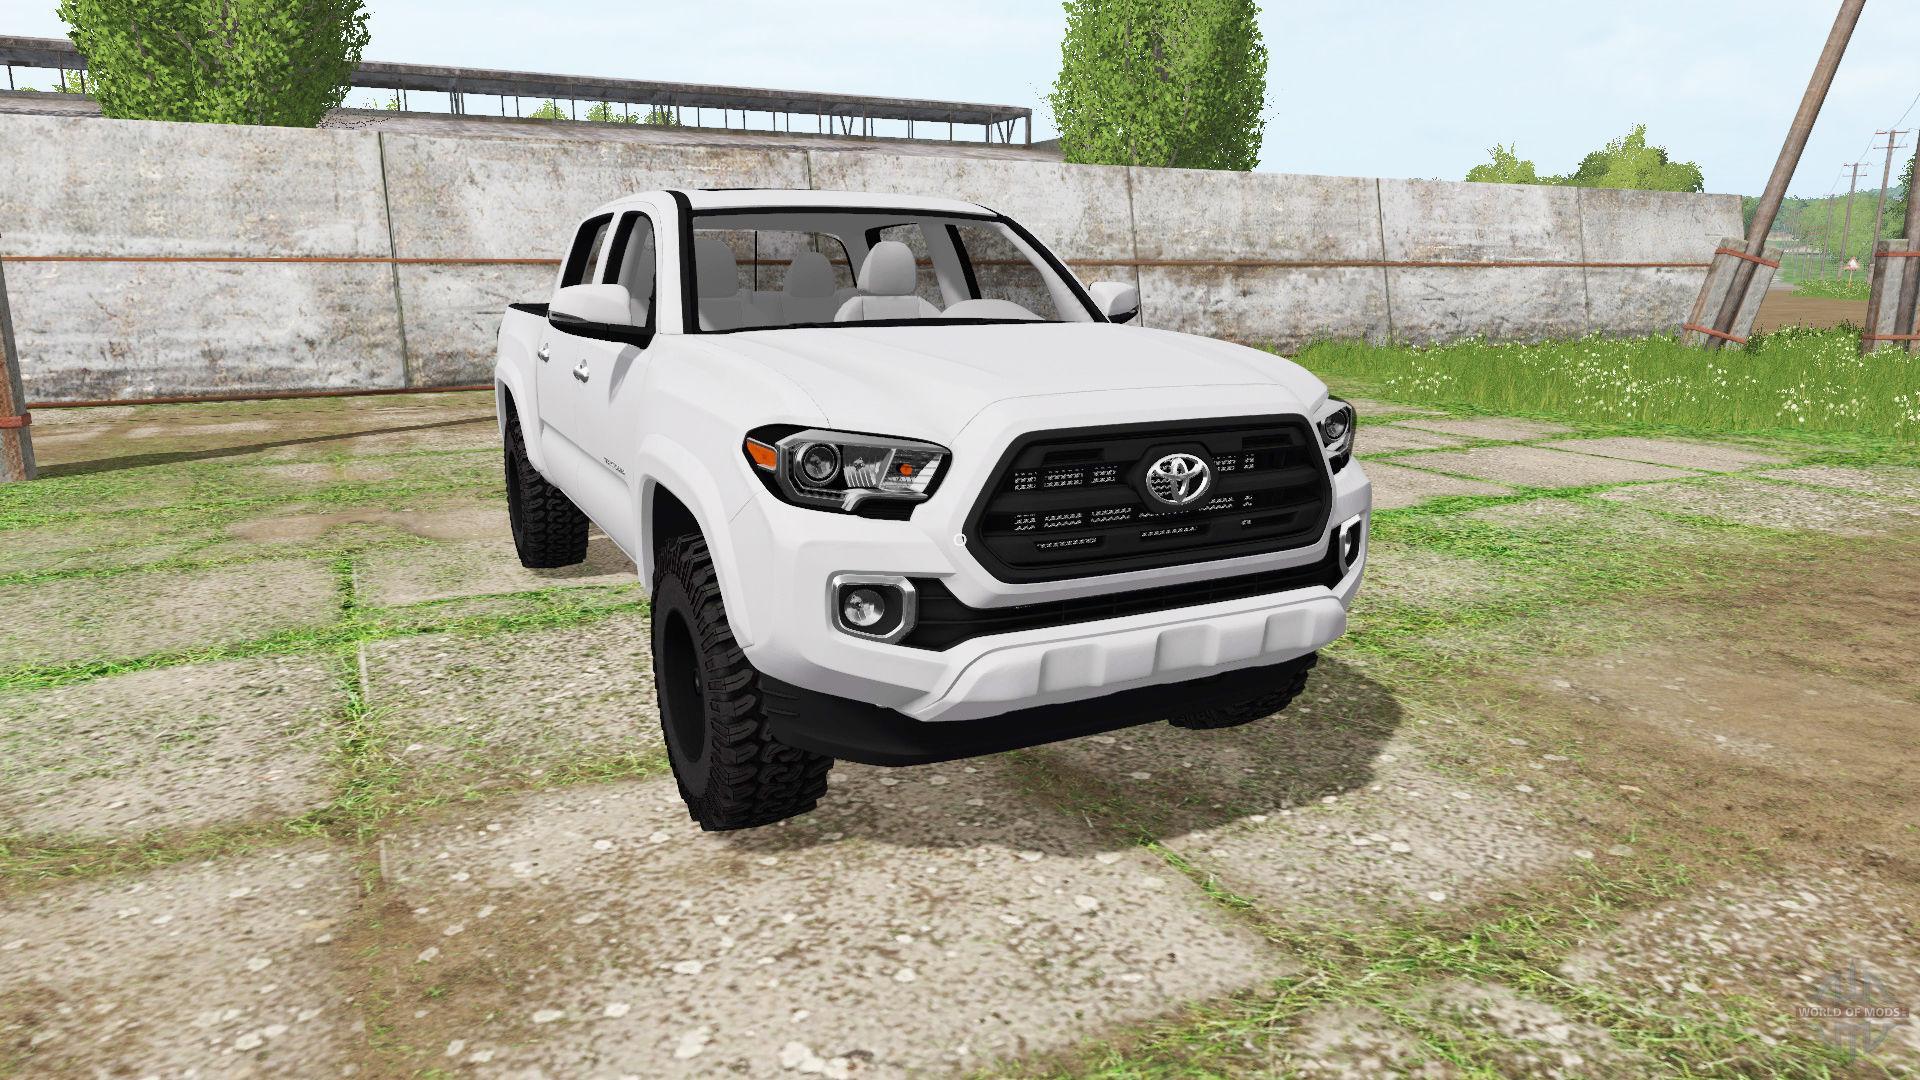 Ls 350 2017 >> TOYOTA TACOMA DOUBLE CAB 2016 LS 17 - Farming Simulator 2017 mod, LS 2017 mod / FS 17 mod